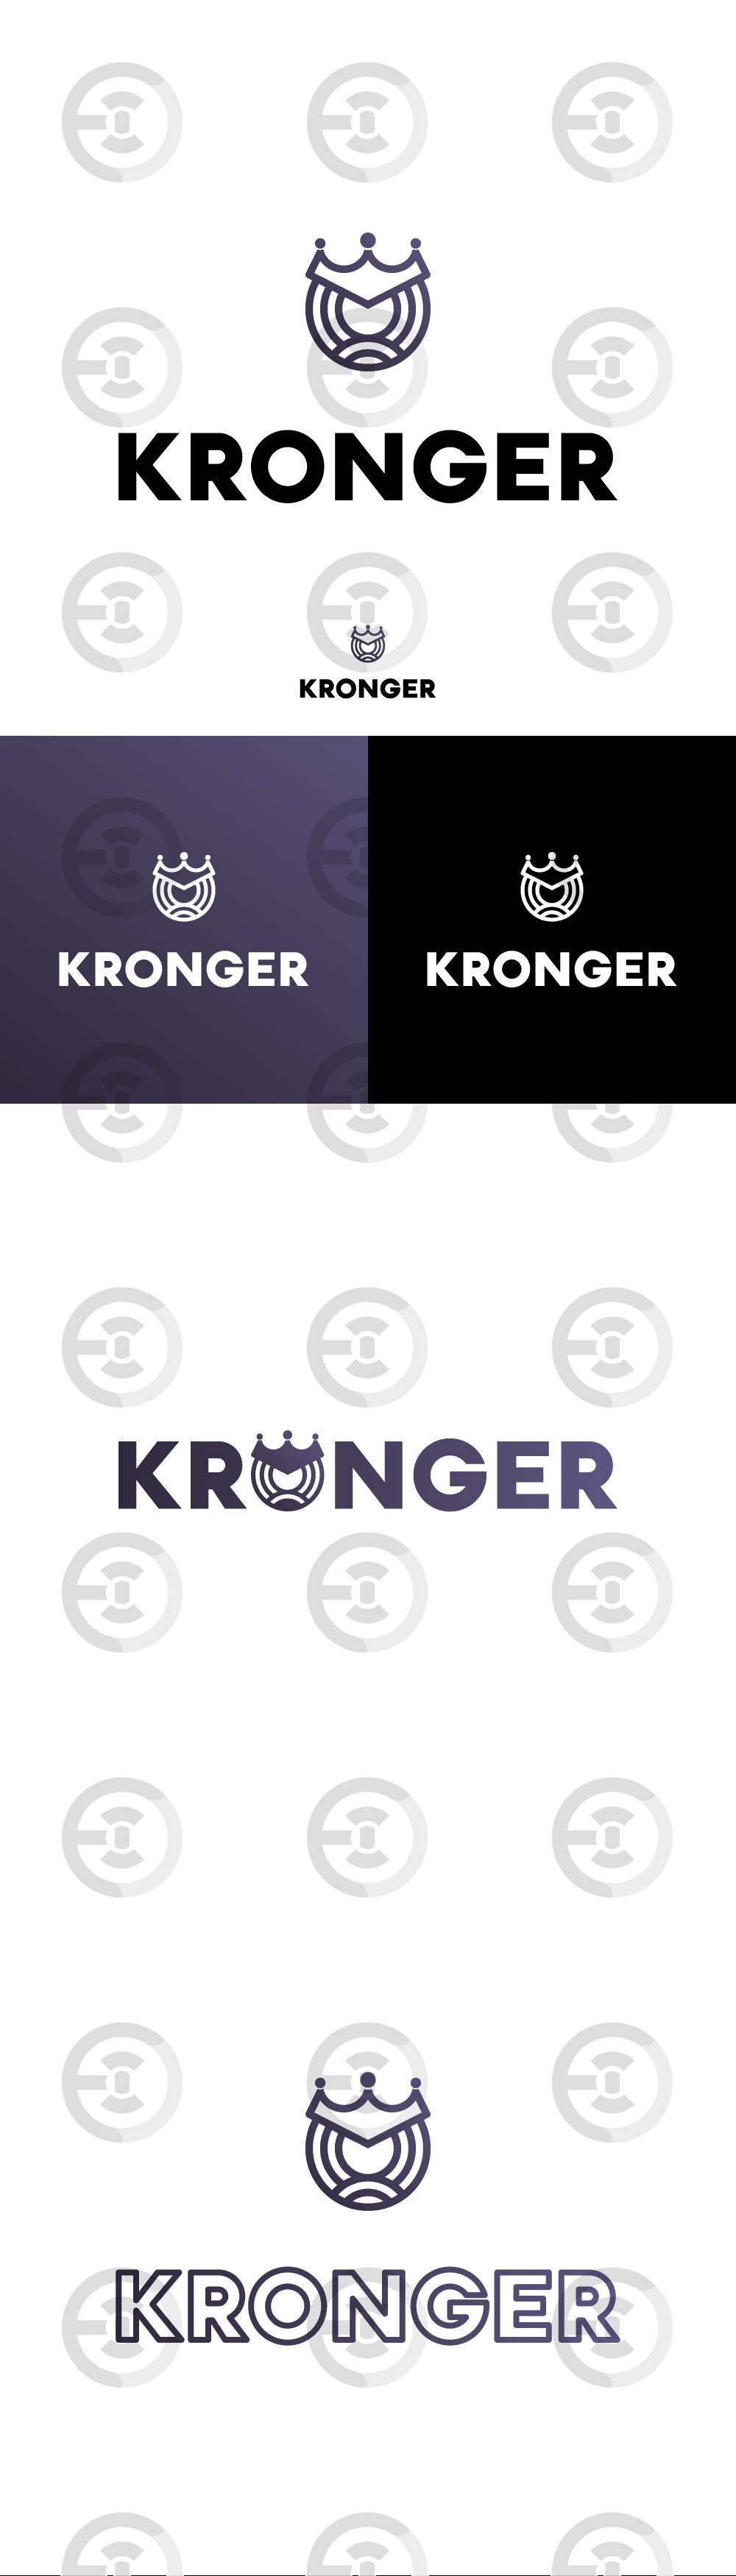 Kronger2.png